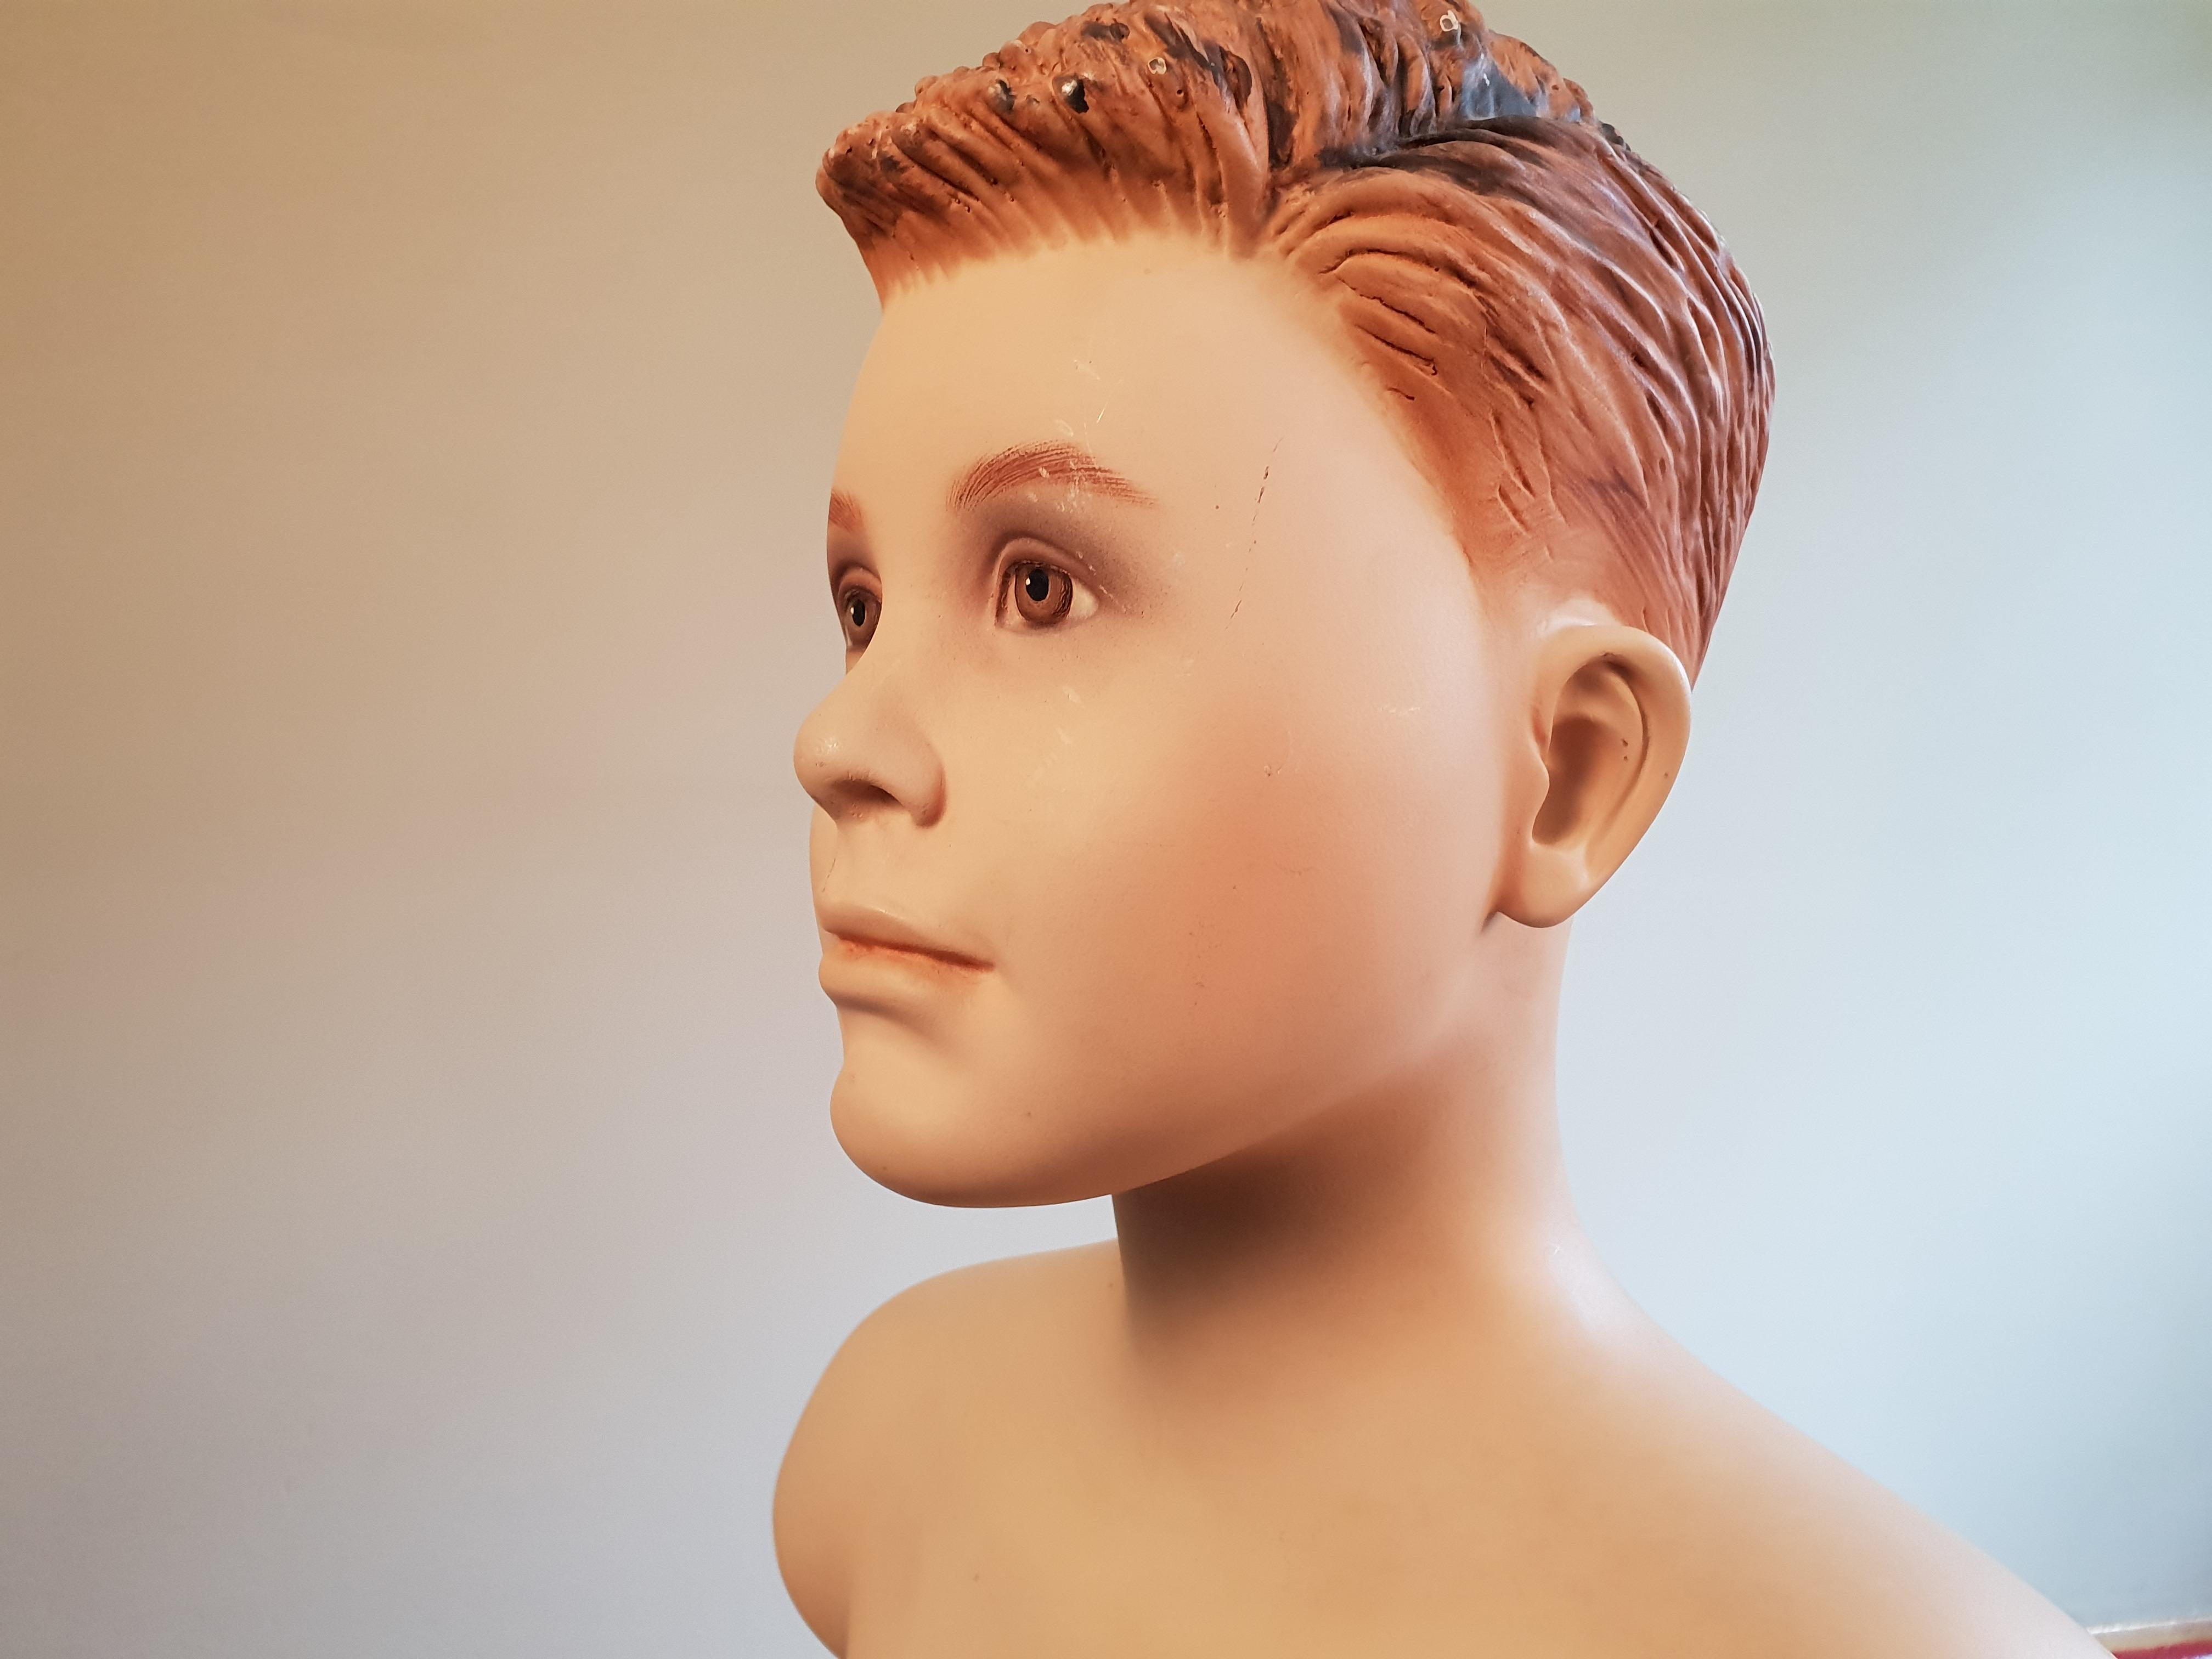 Verrassend Barlington - Fiberglass vintage paspop 12 tot 14 jarige jongen QJ-27